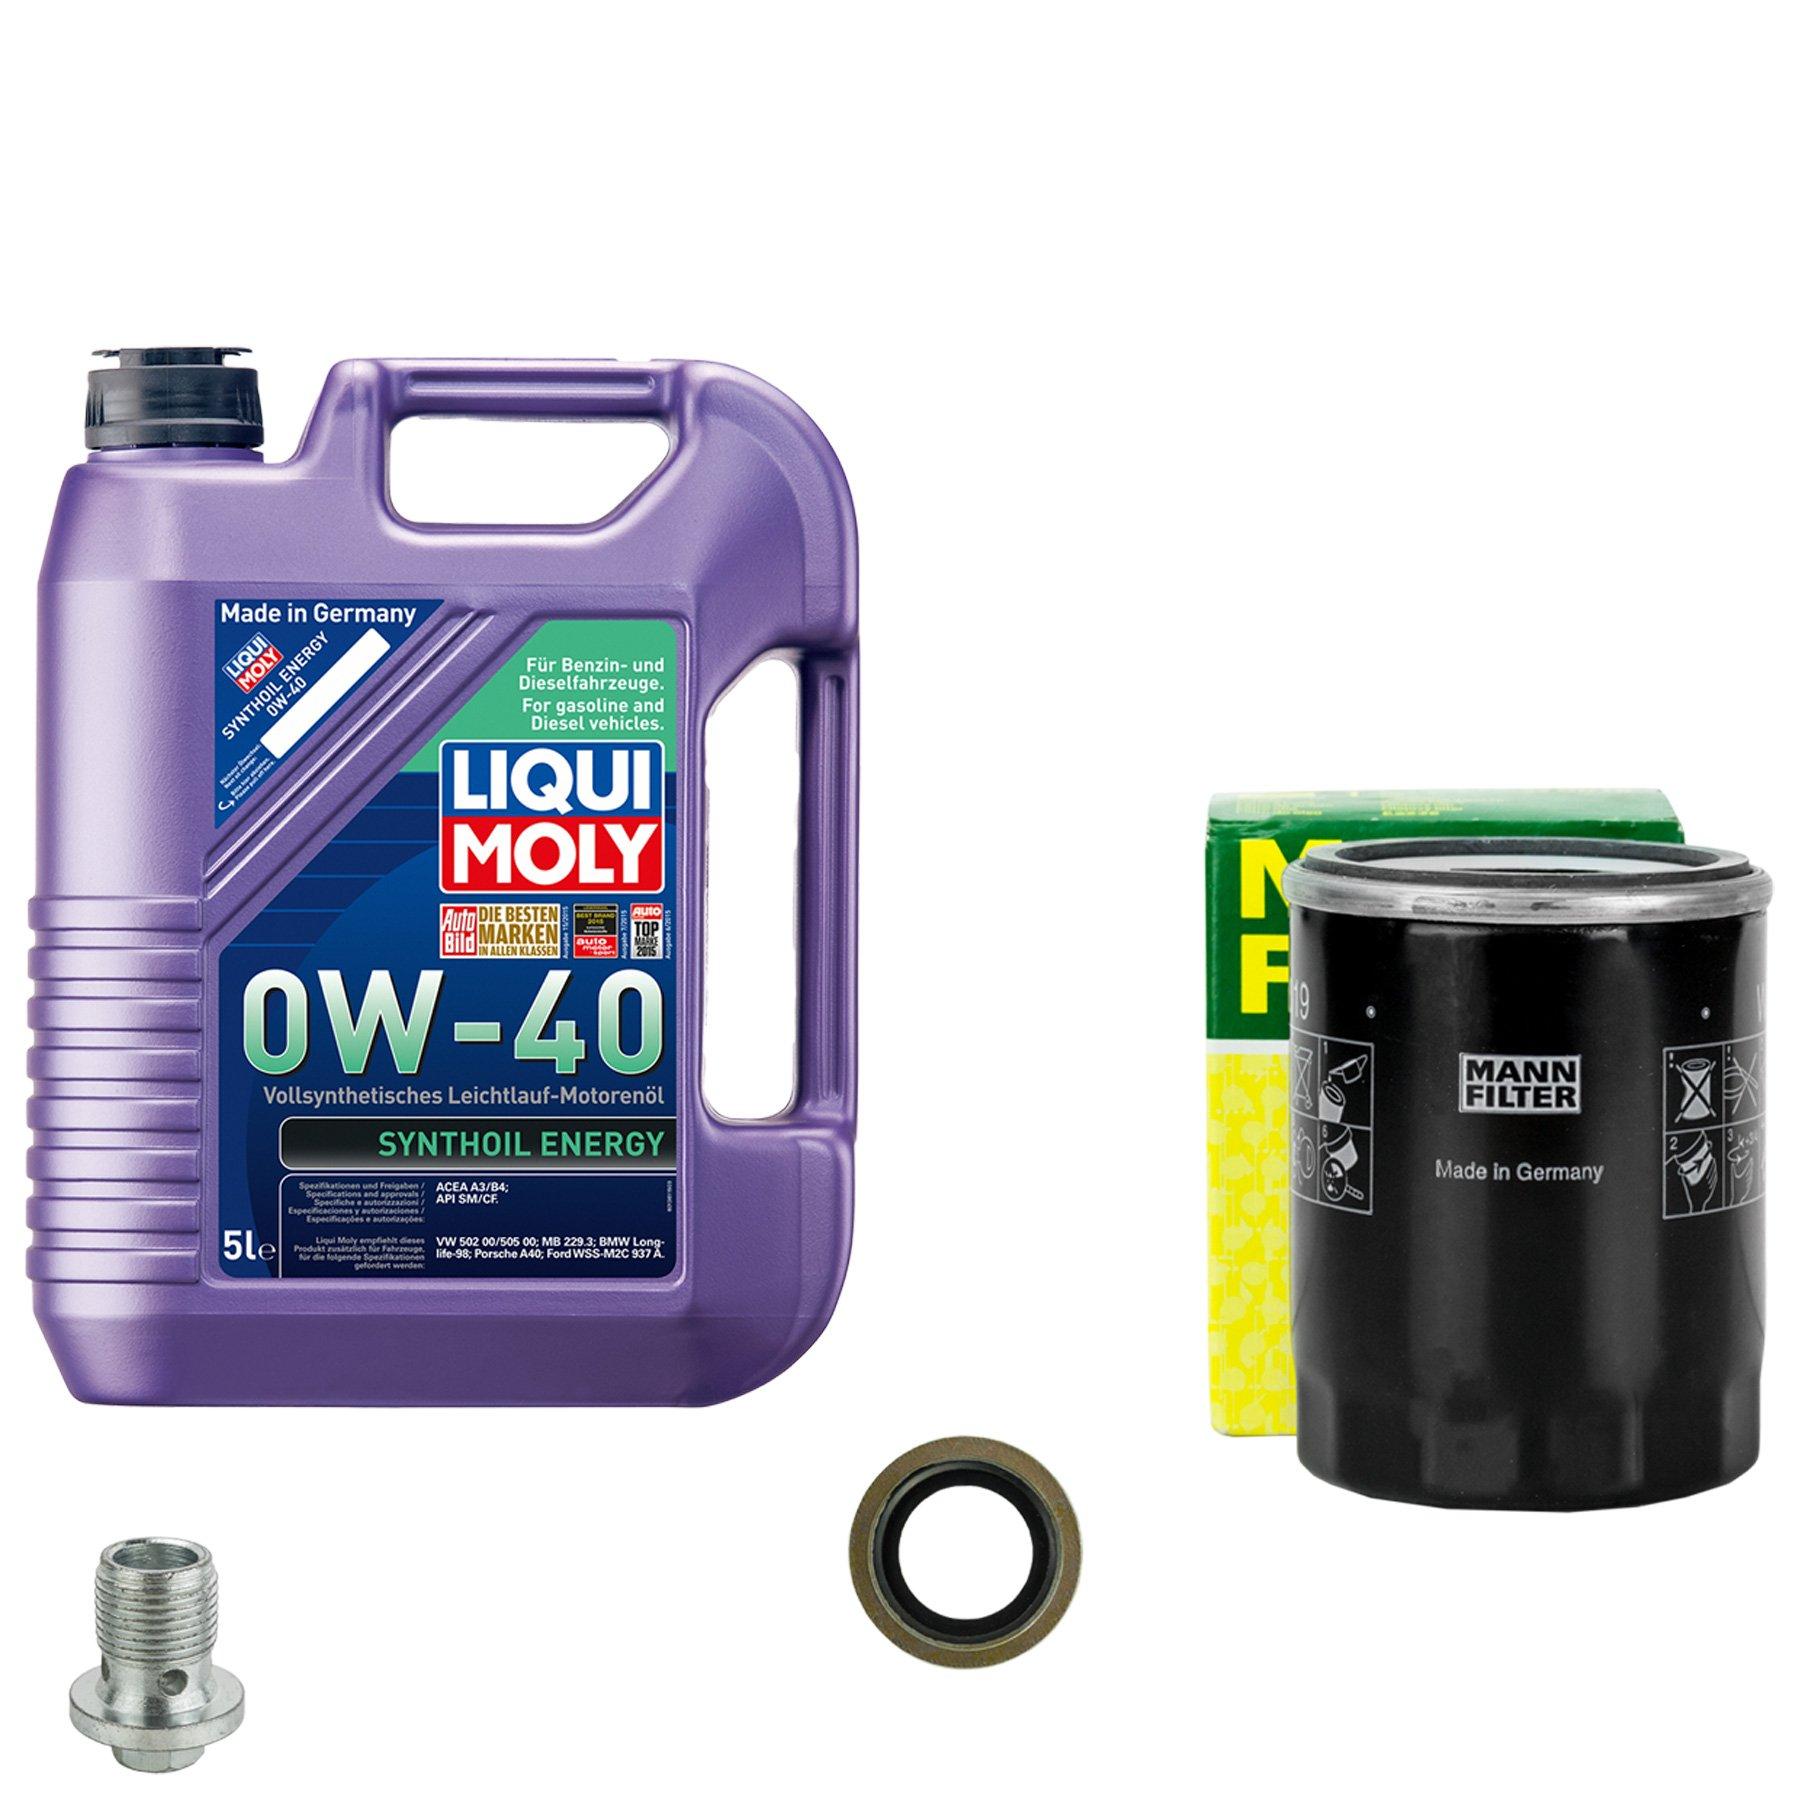 Ölwechsel set komplett 5l lm 0w-40 + mann filter Ölfilter opel